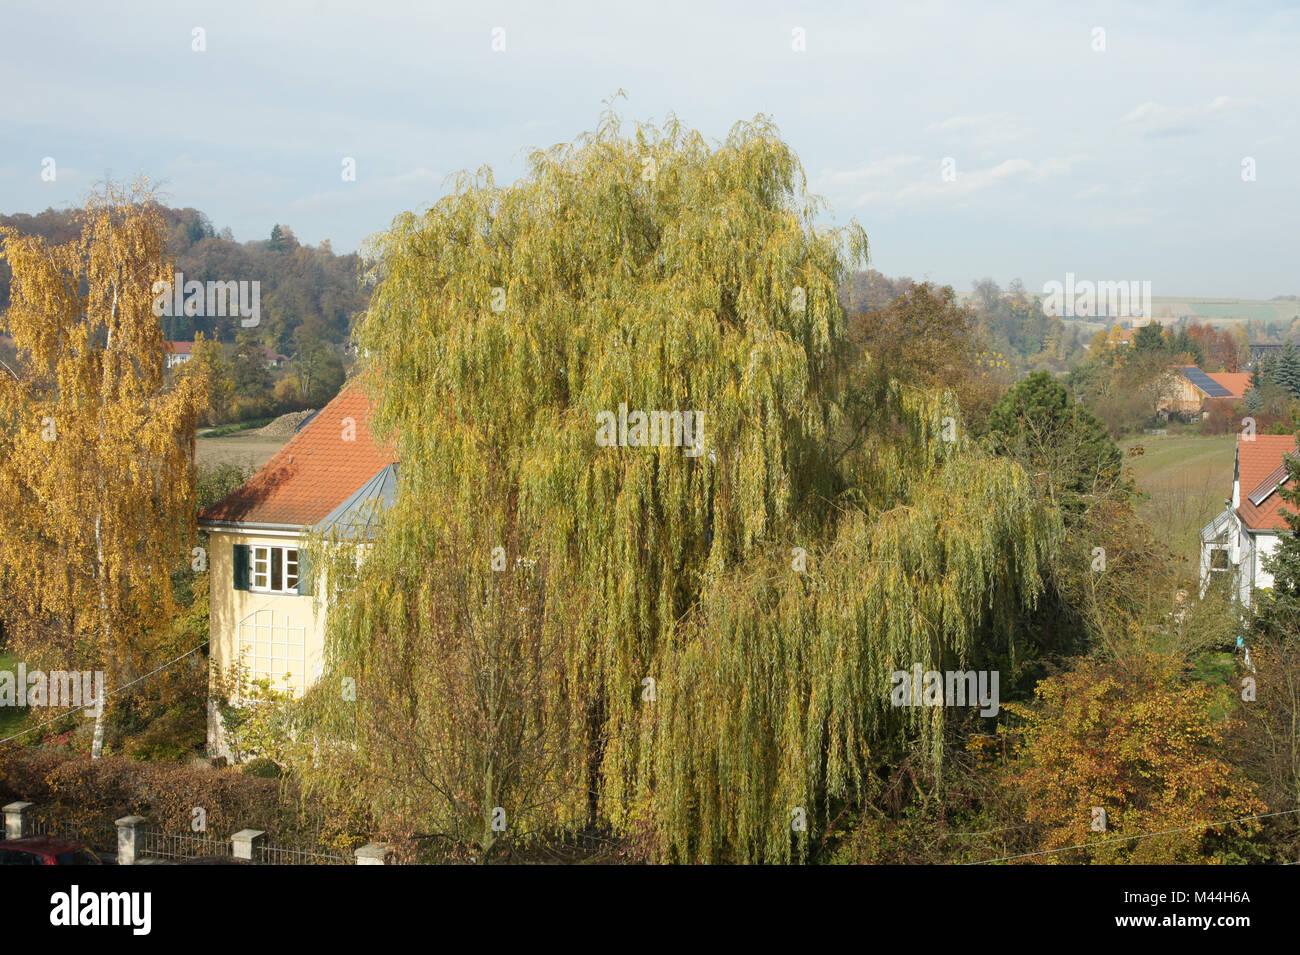 Salix alba Tristis, Trauerweide, weeping willow - Stock Image